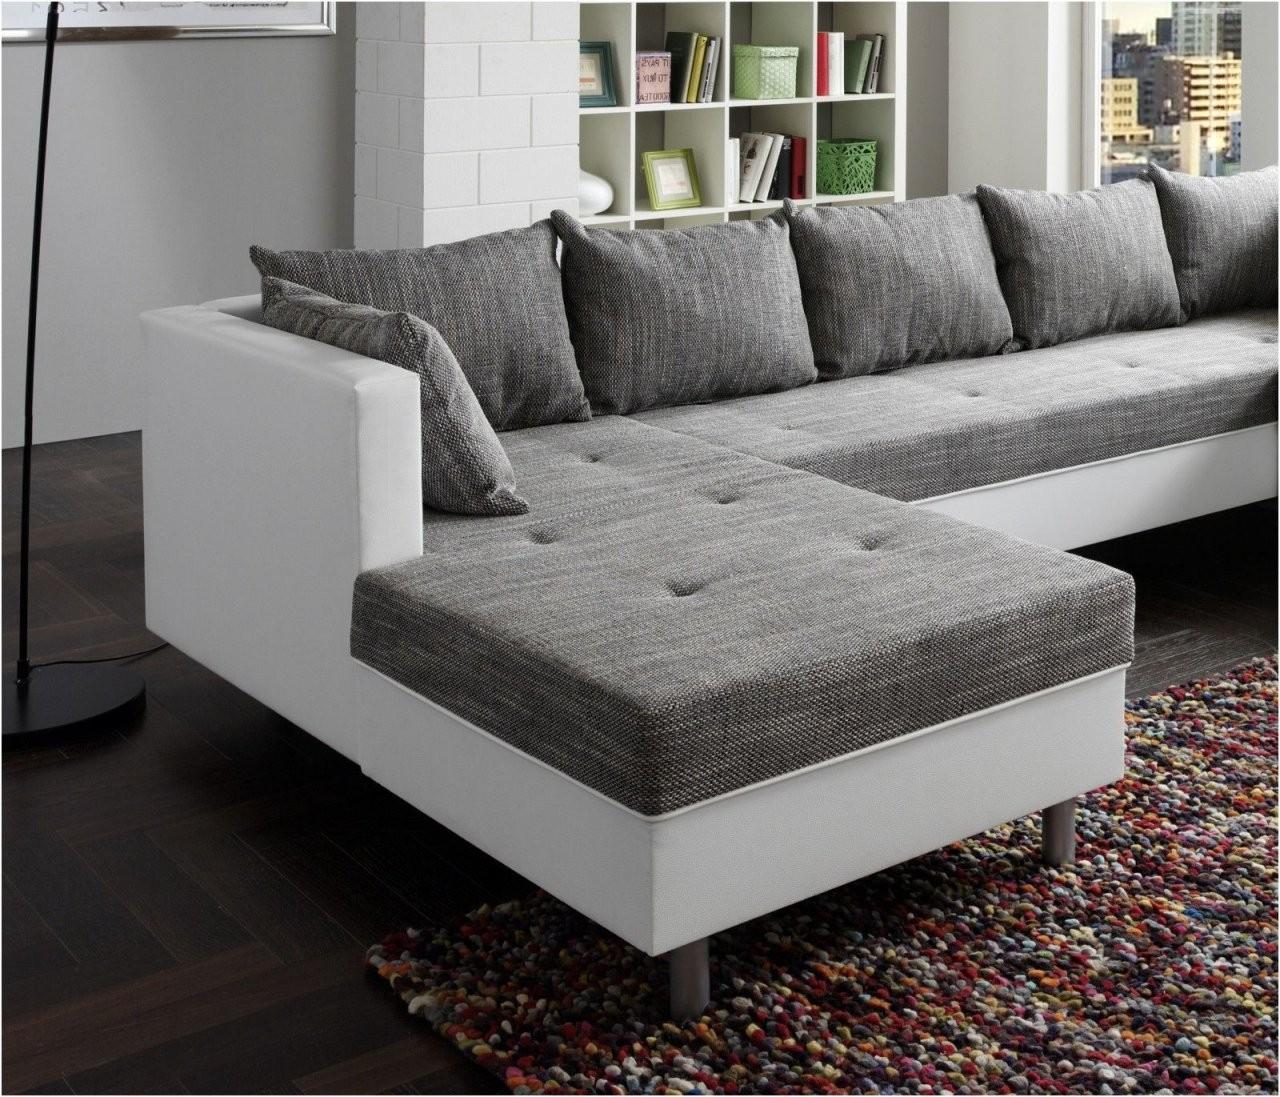 Fabulous Big Sofa Möbel Boss  Couch Möbel  Big Sofas Sofa Couch von Möbel Boss Big Sofa Bild